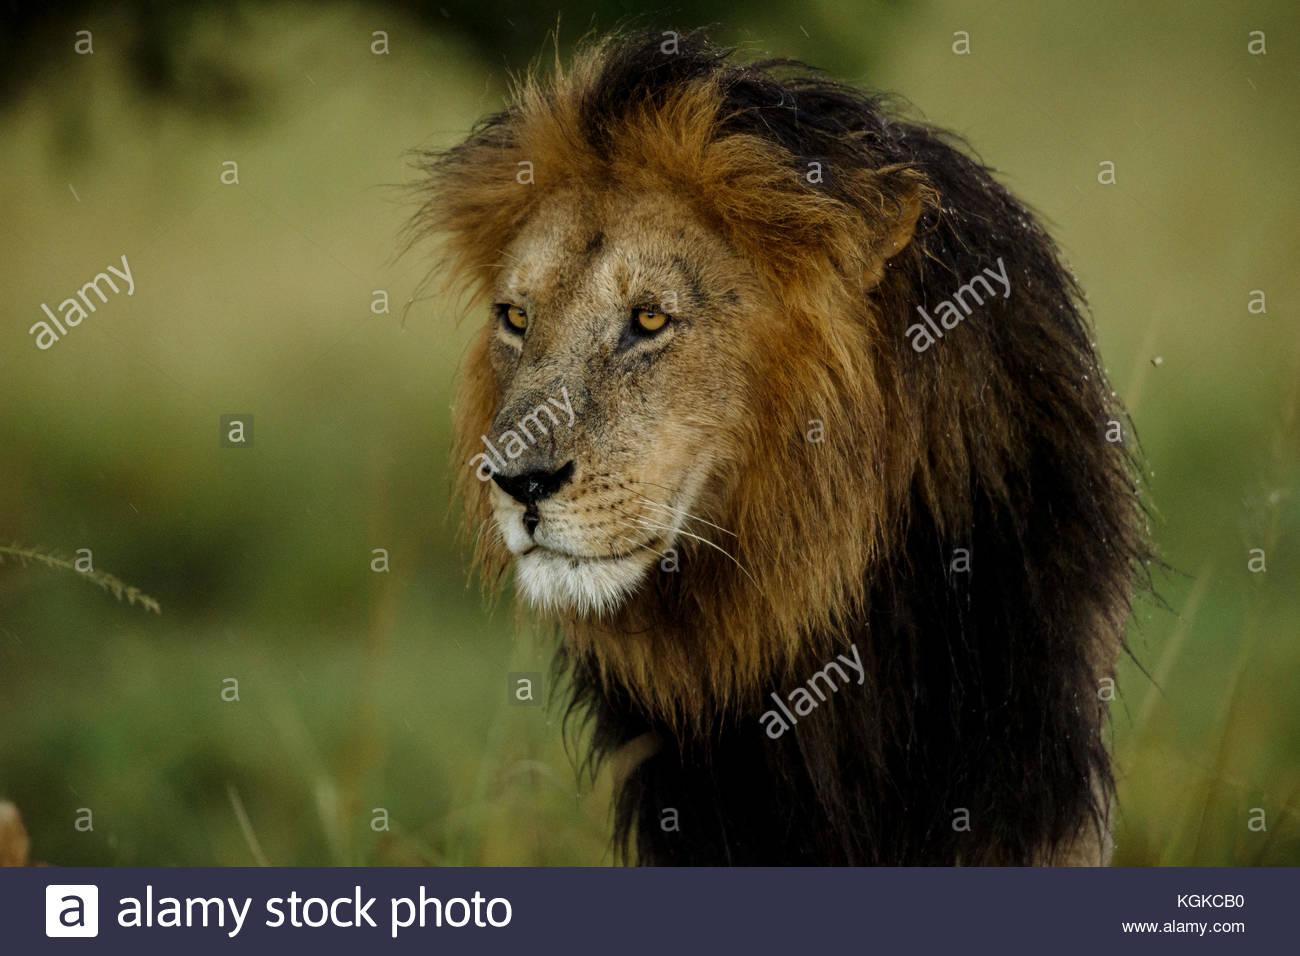 Retrato de un hombre león, Panthera leo, en la Reserva Nacional de Masai Mara. Imagen De Stock